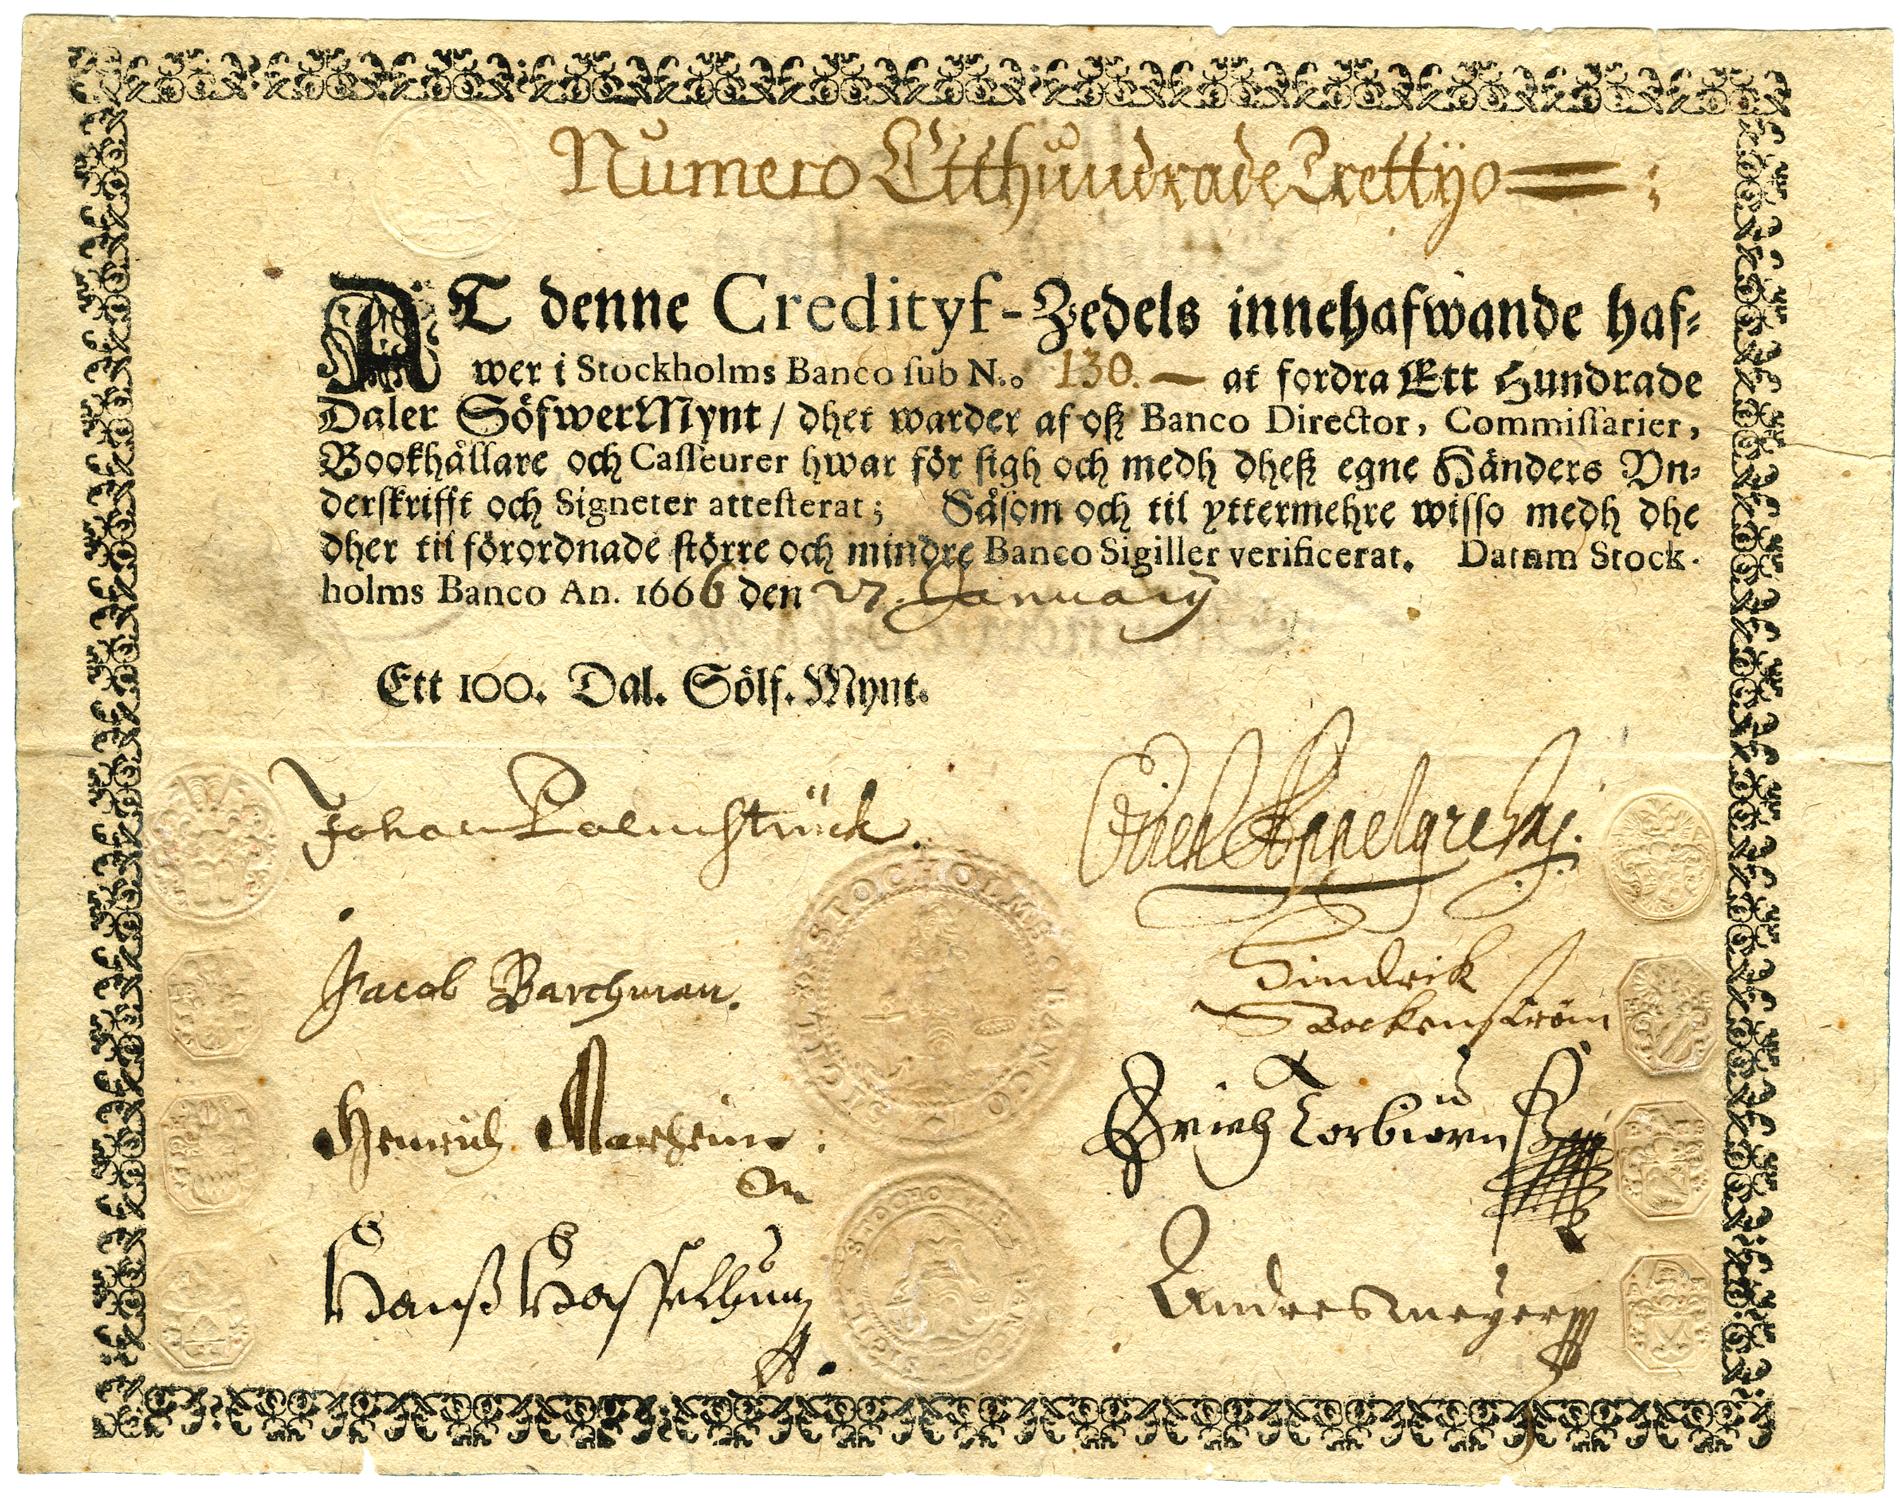 Kreditivsedel-100-daler-silvermynt_Palmstruchare_kopia